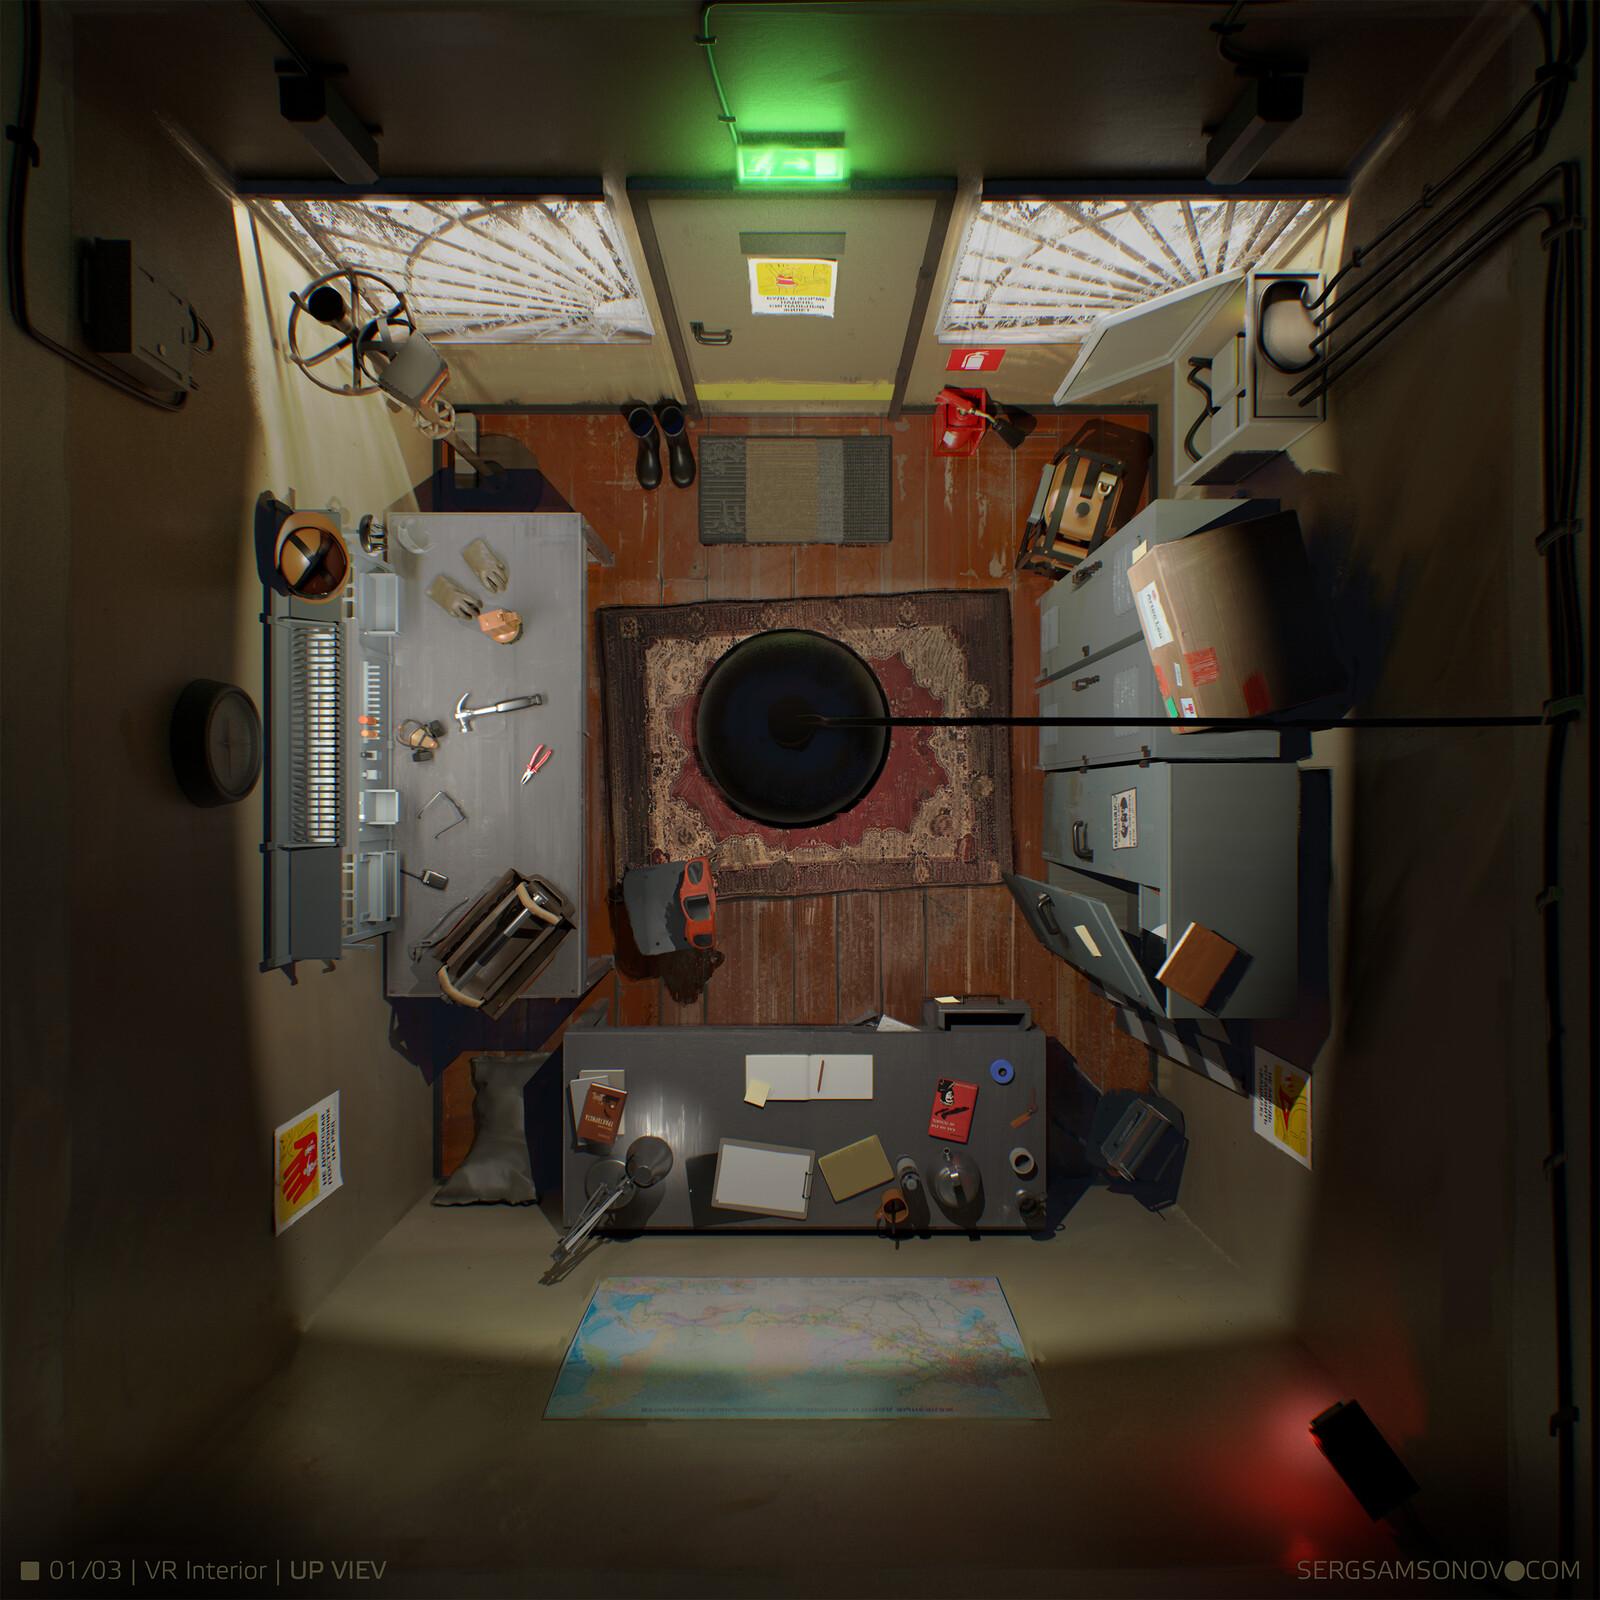 Concept environment interior for VR